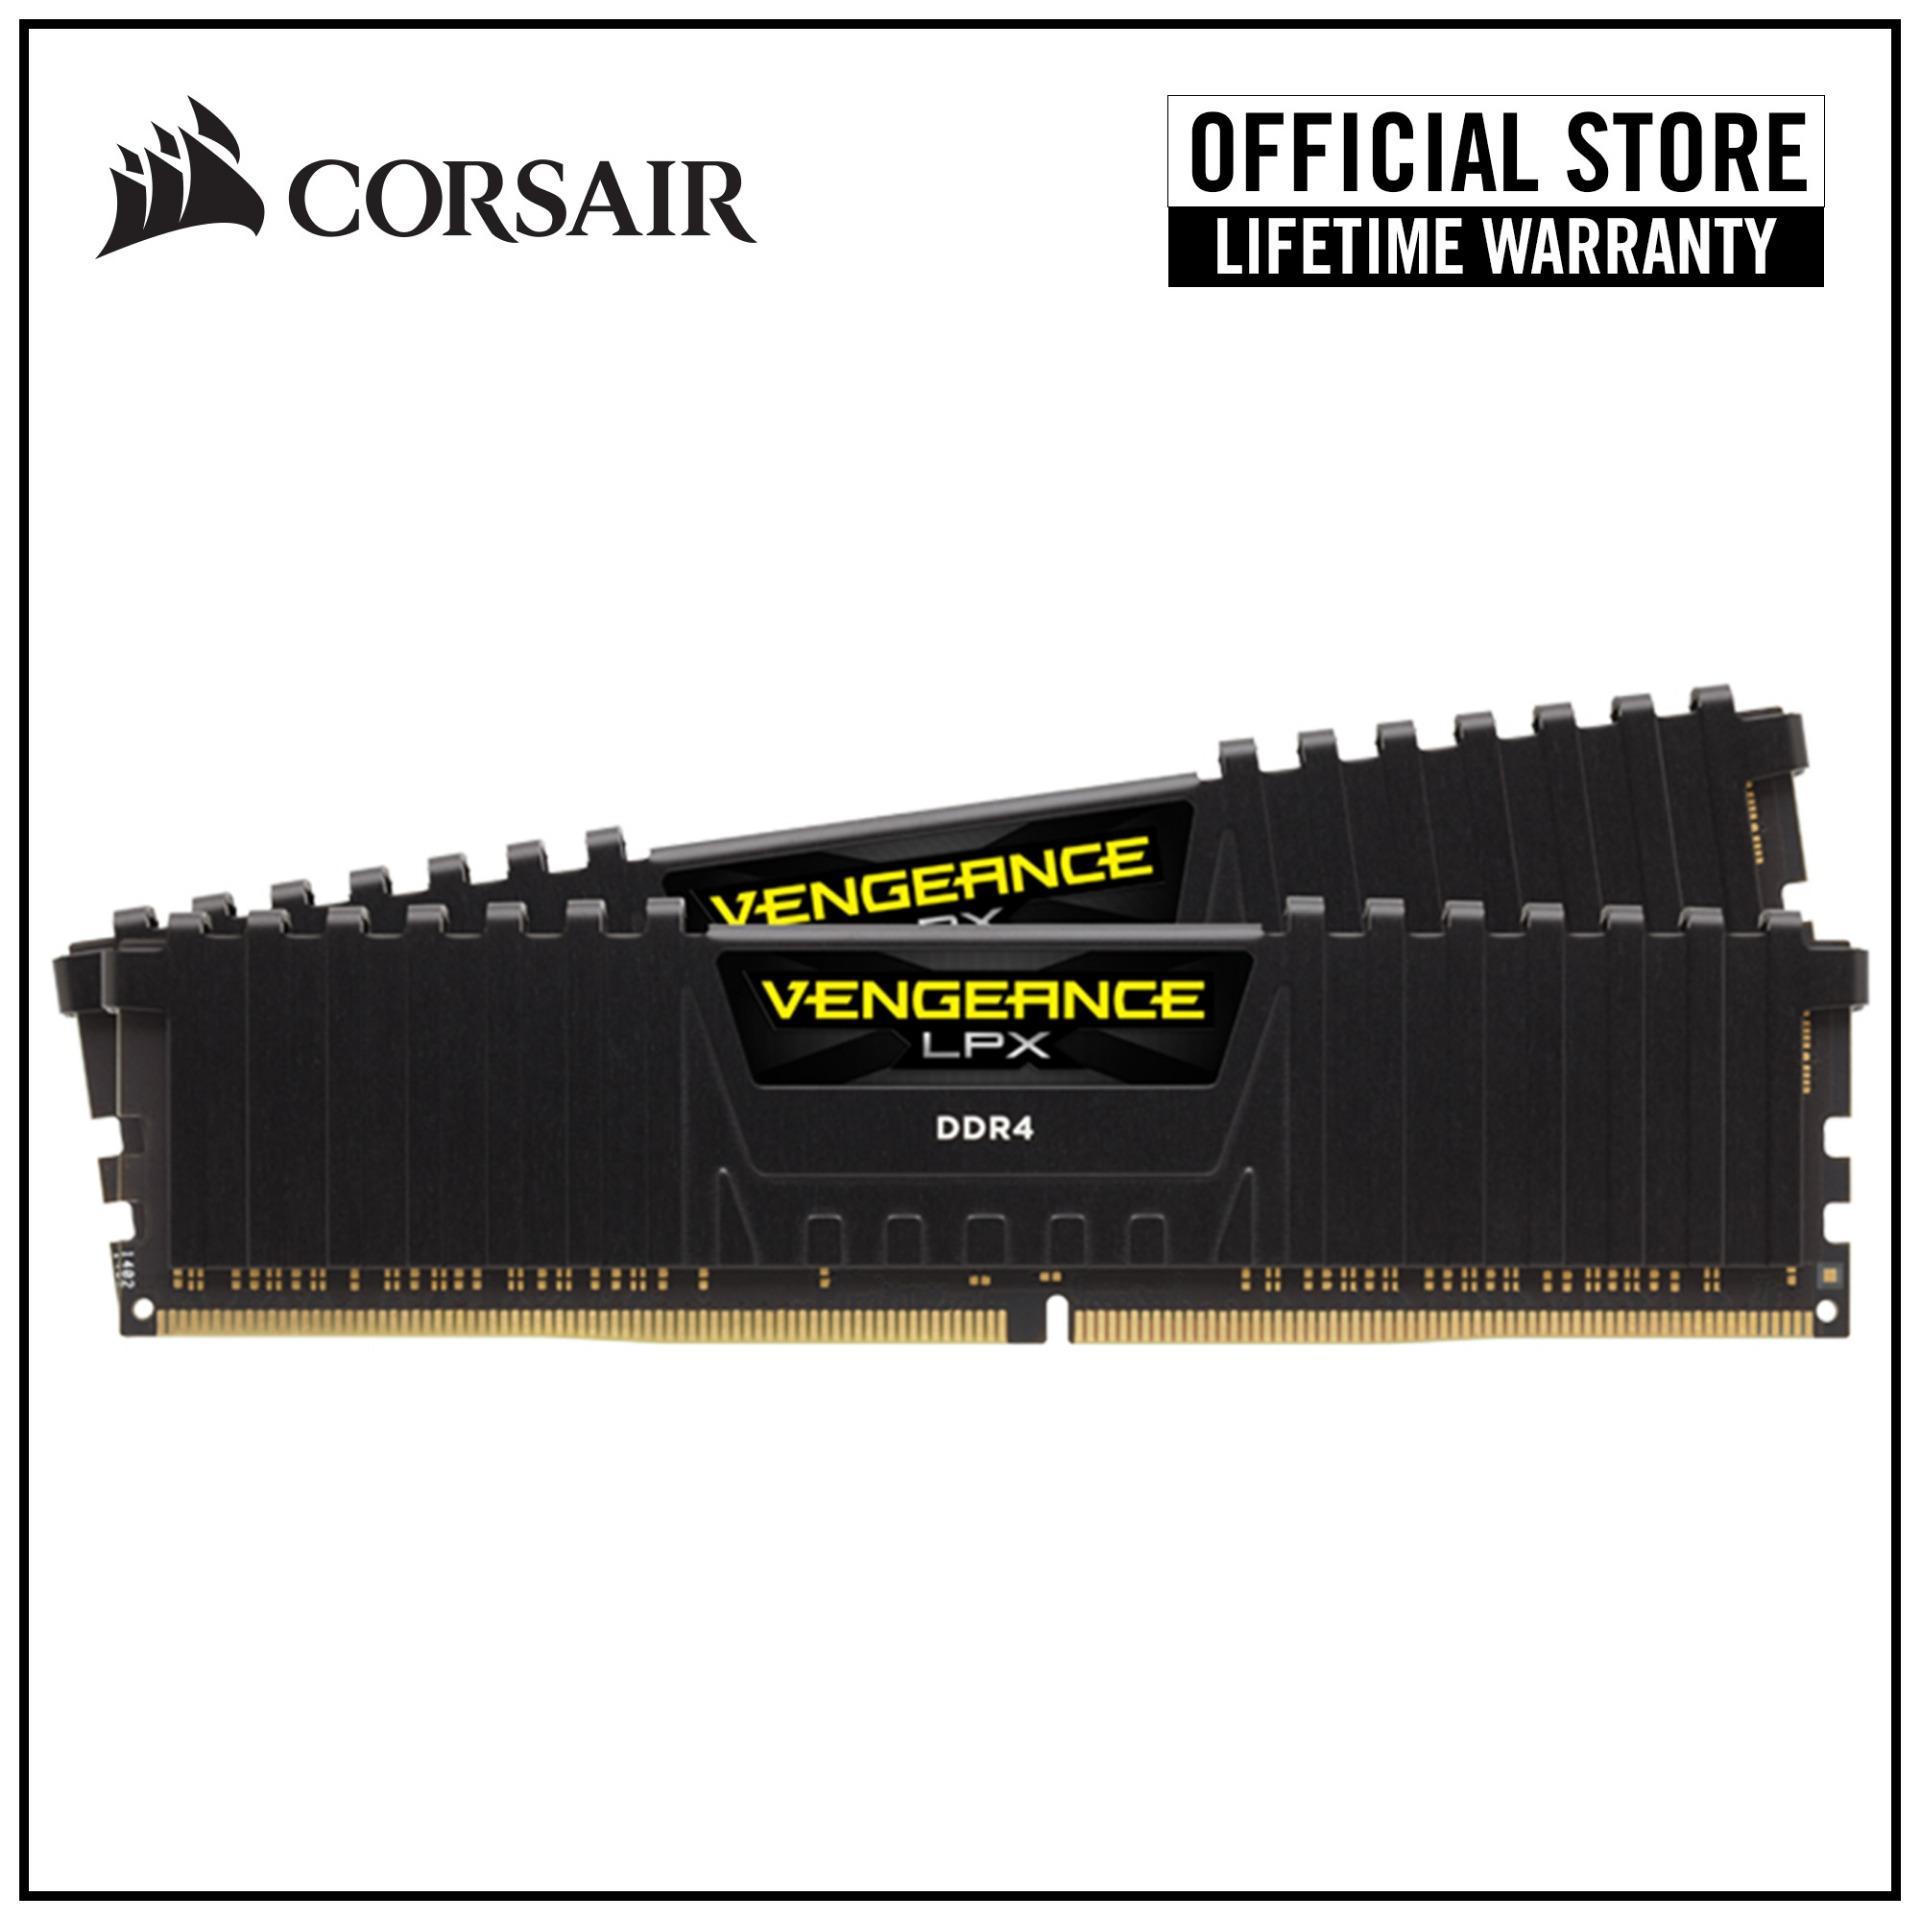 Corsair Vengeance Lpx Ryzen Certified 16gb (2x8gb) Ddr4 2933mhz C16 Dimm Desktop Memory Kit - Black By Corsair Official Store.